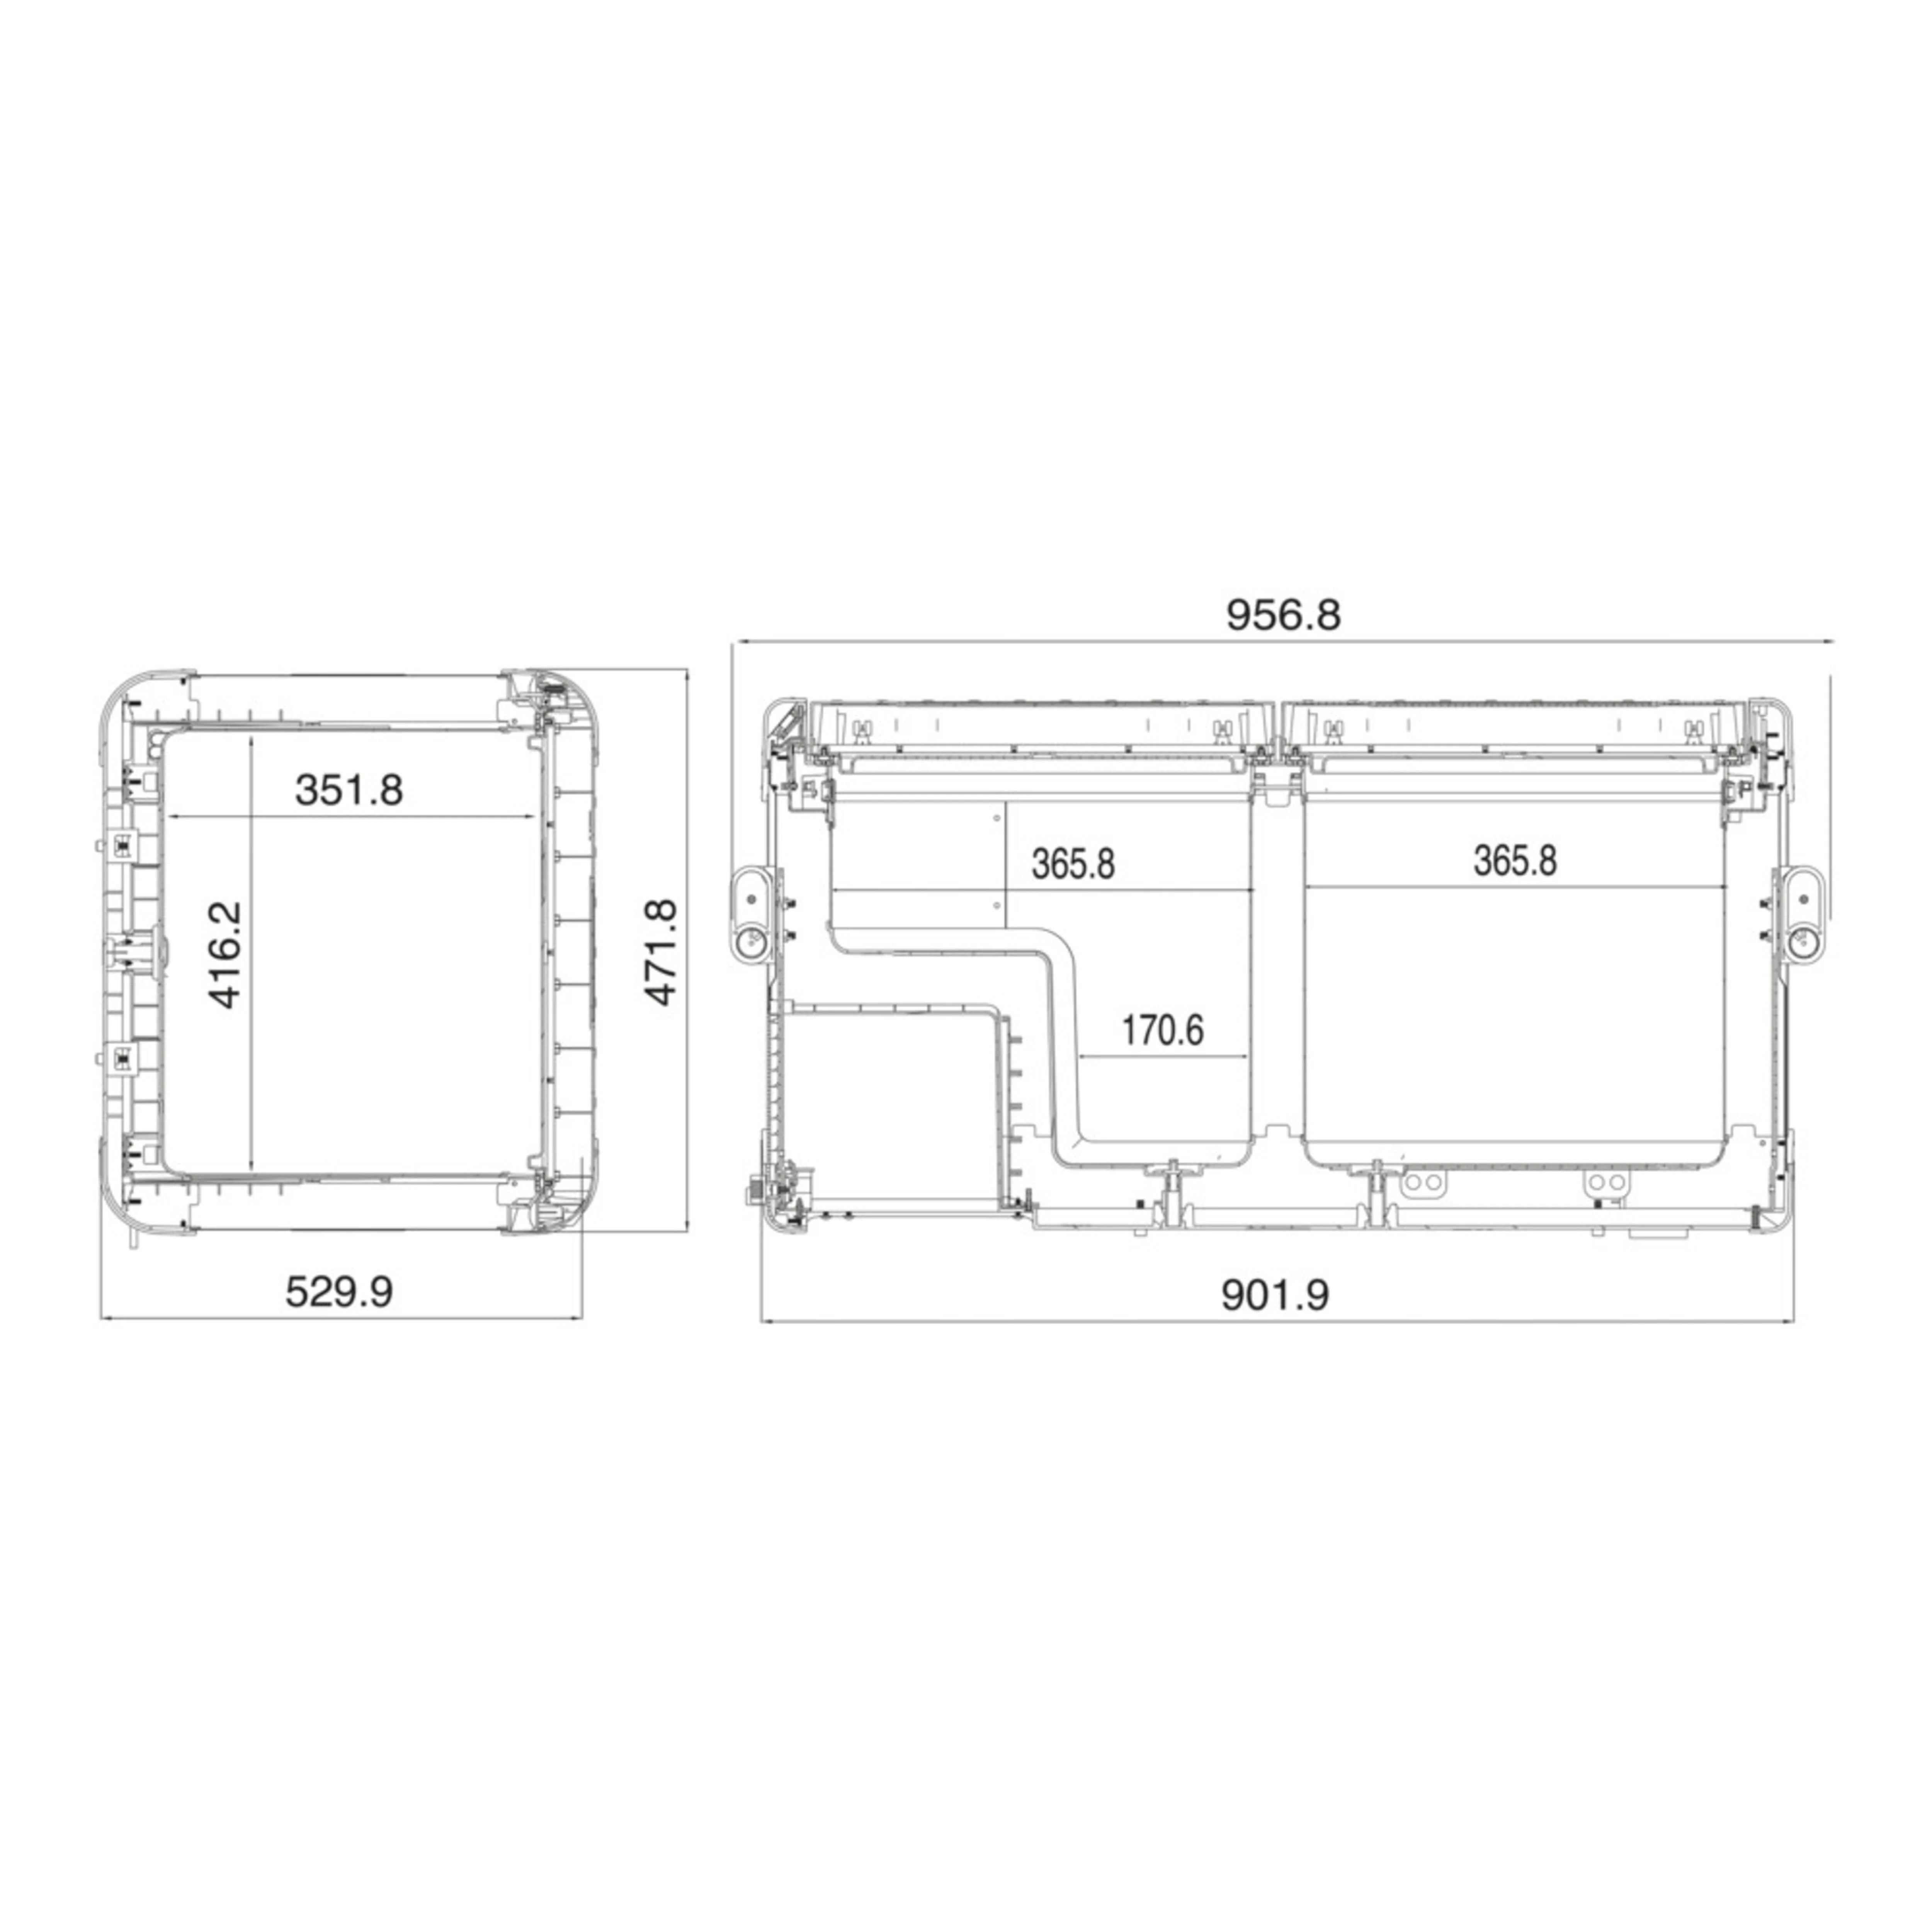 medium resolution of cfx 95 technical drawing 2